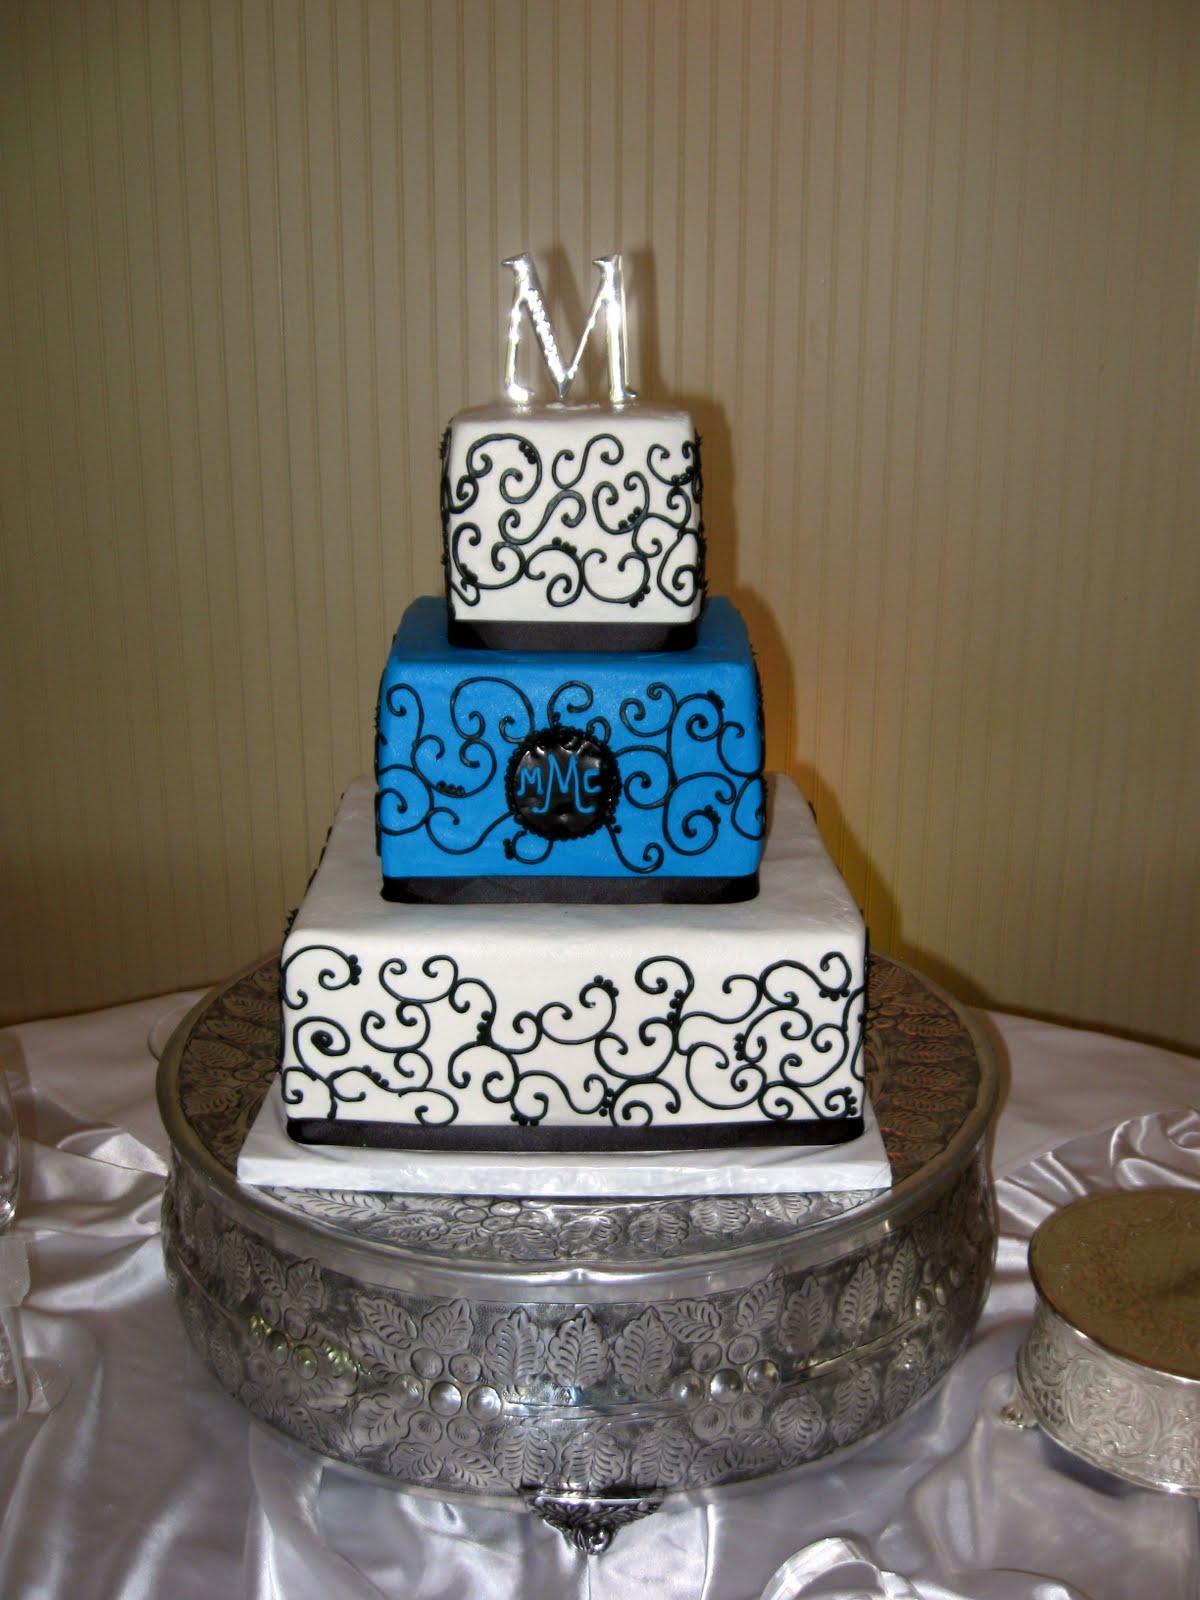 Cake Decorations Taunton : Walnut Creek Chapel: Melissa Michelle Myers & Jesse Colt Musick Wedding and Reception at Walnut ...